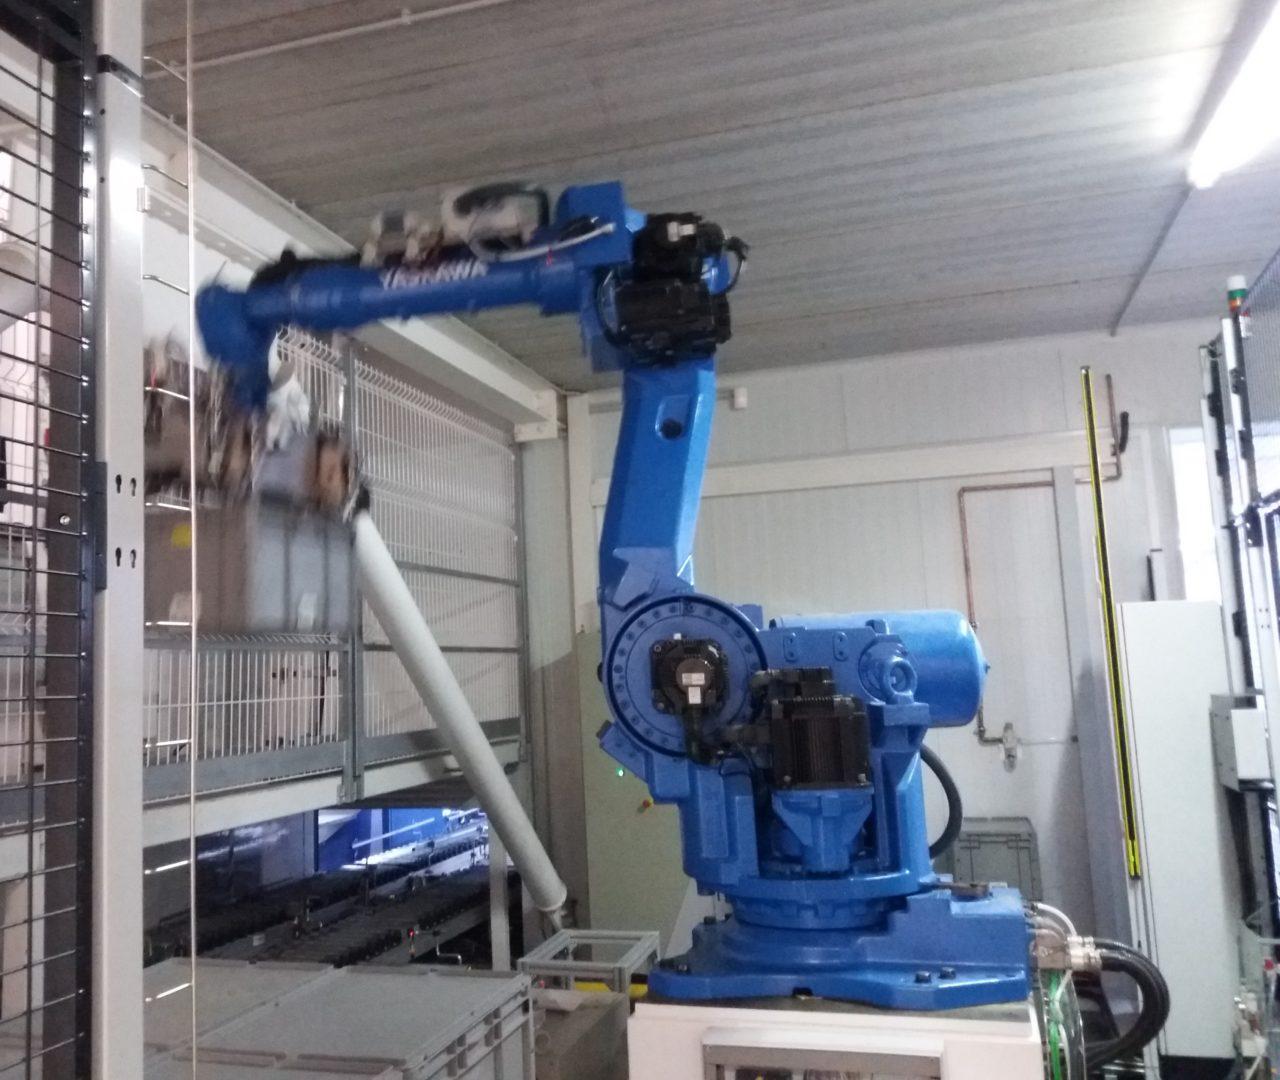 Robot, cel·la robotitzada, ISO 10218,